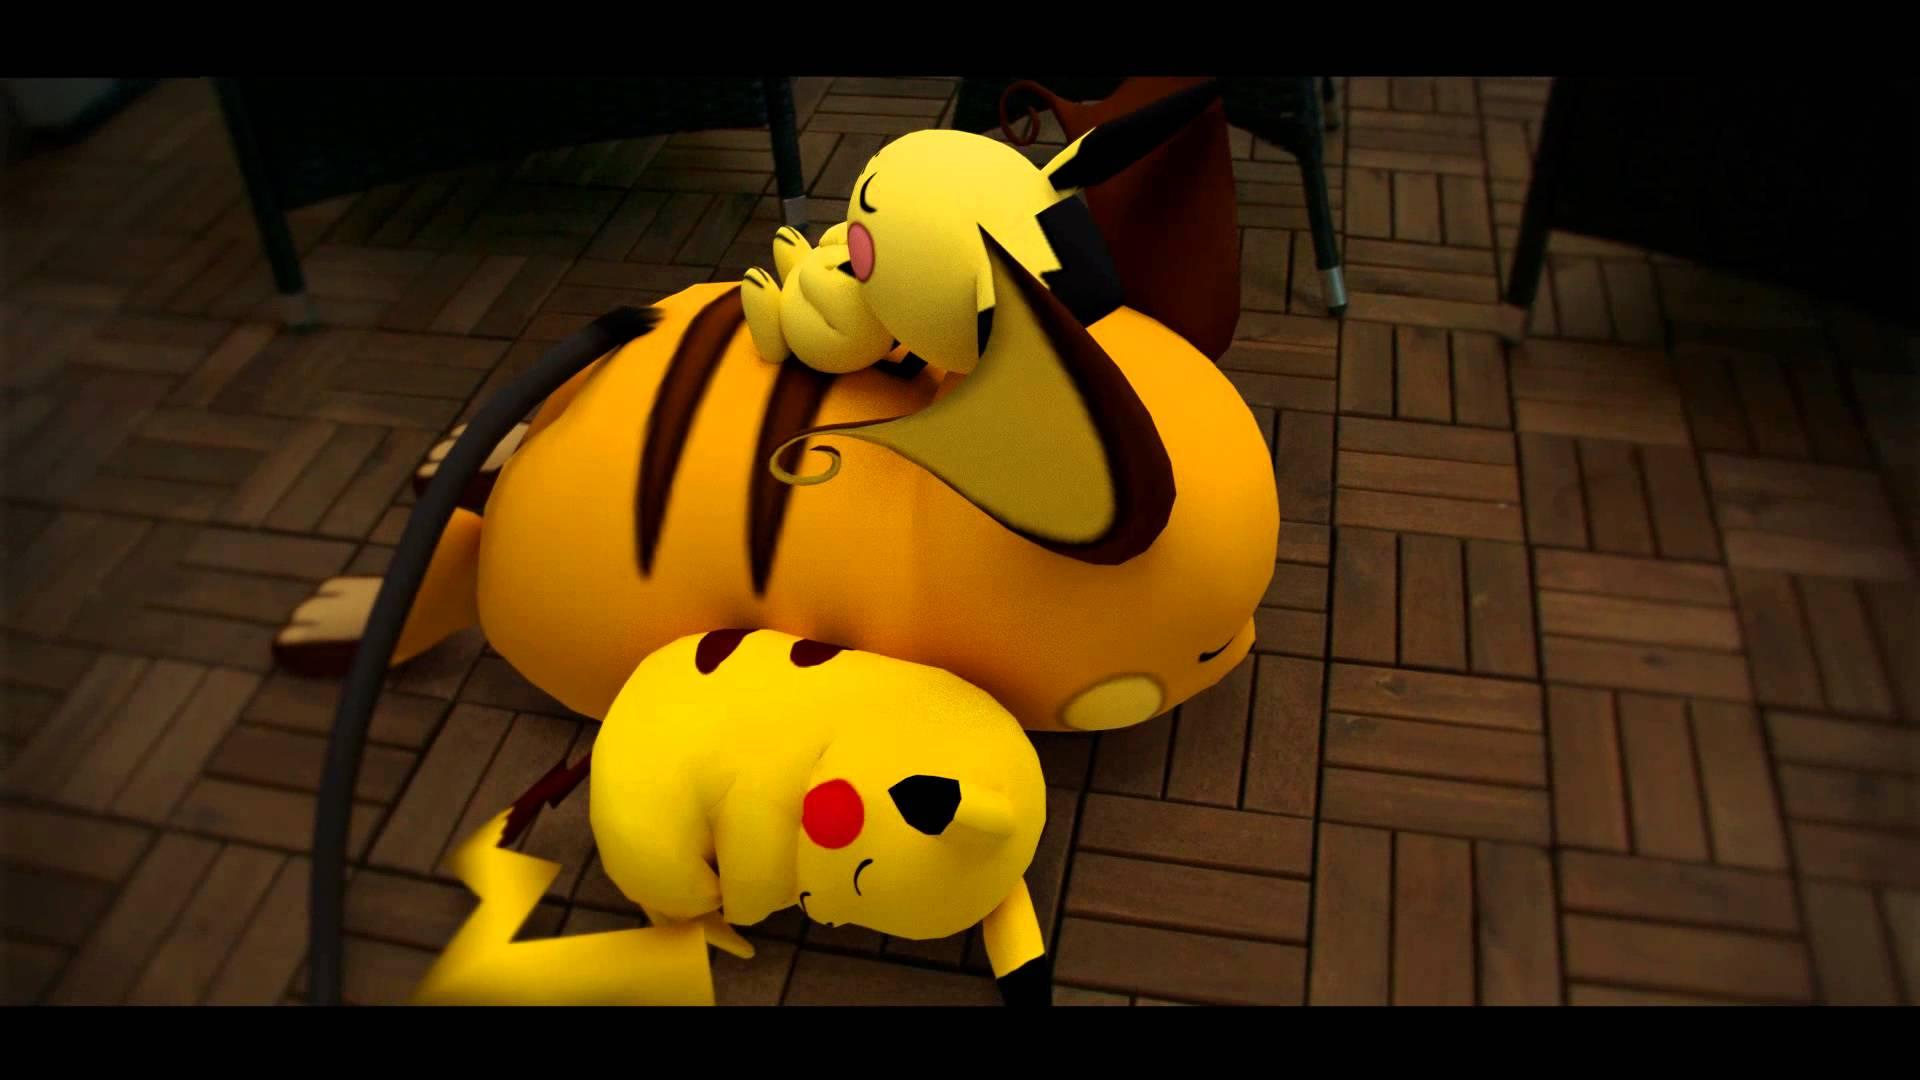 Cute Baby Girl Wallpaper Free Download Free Download Pikachu Backgrounds Pixelstalk Net